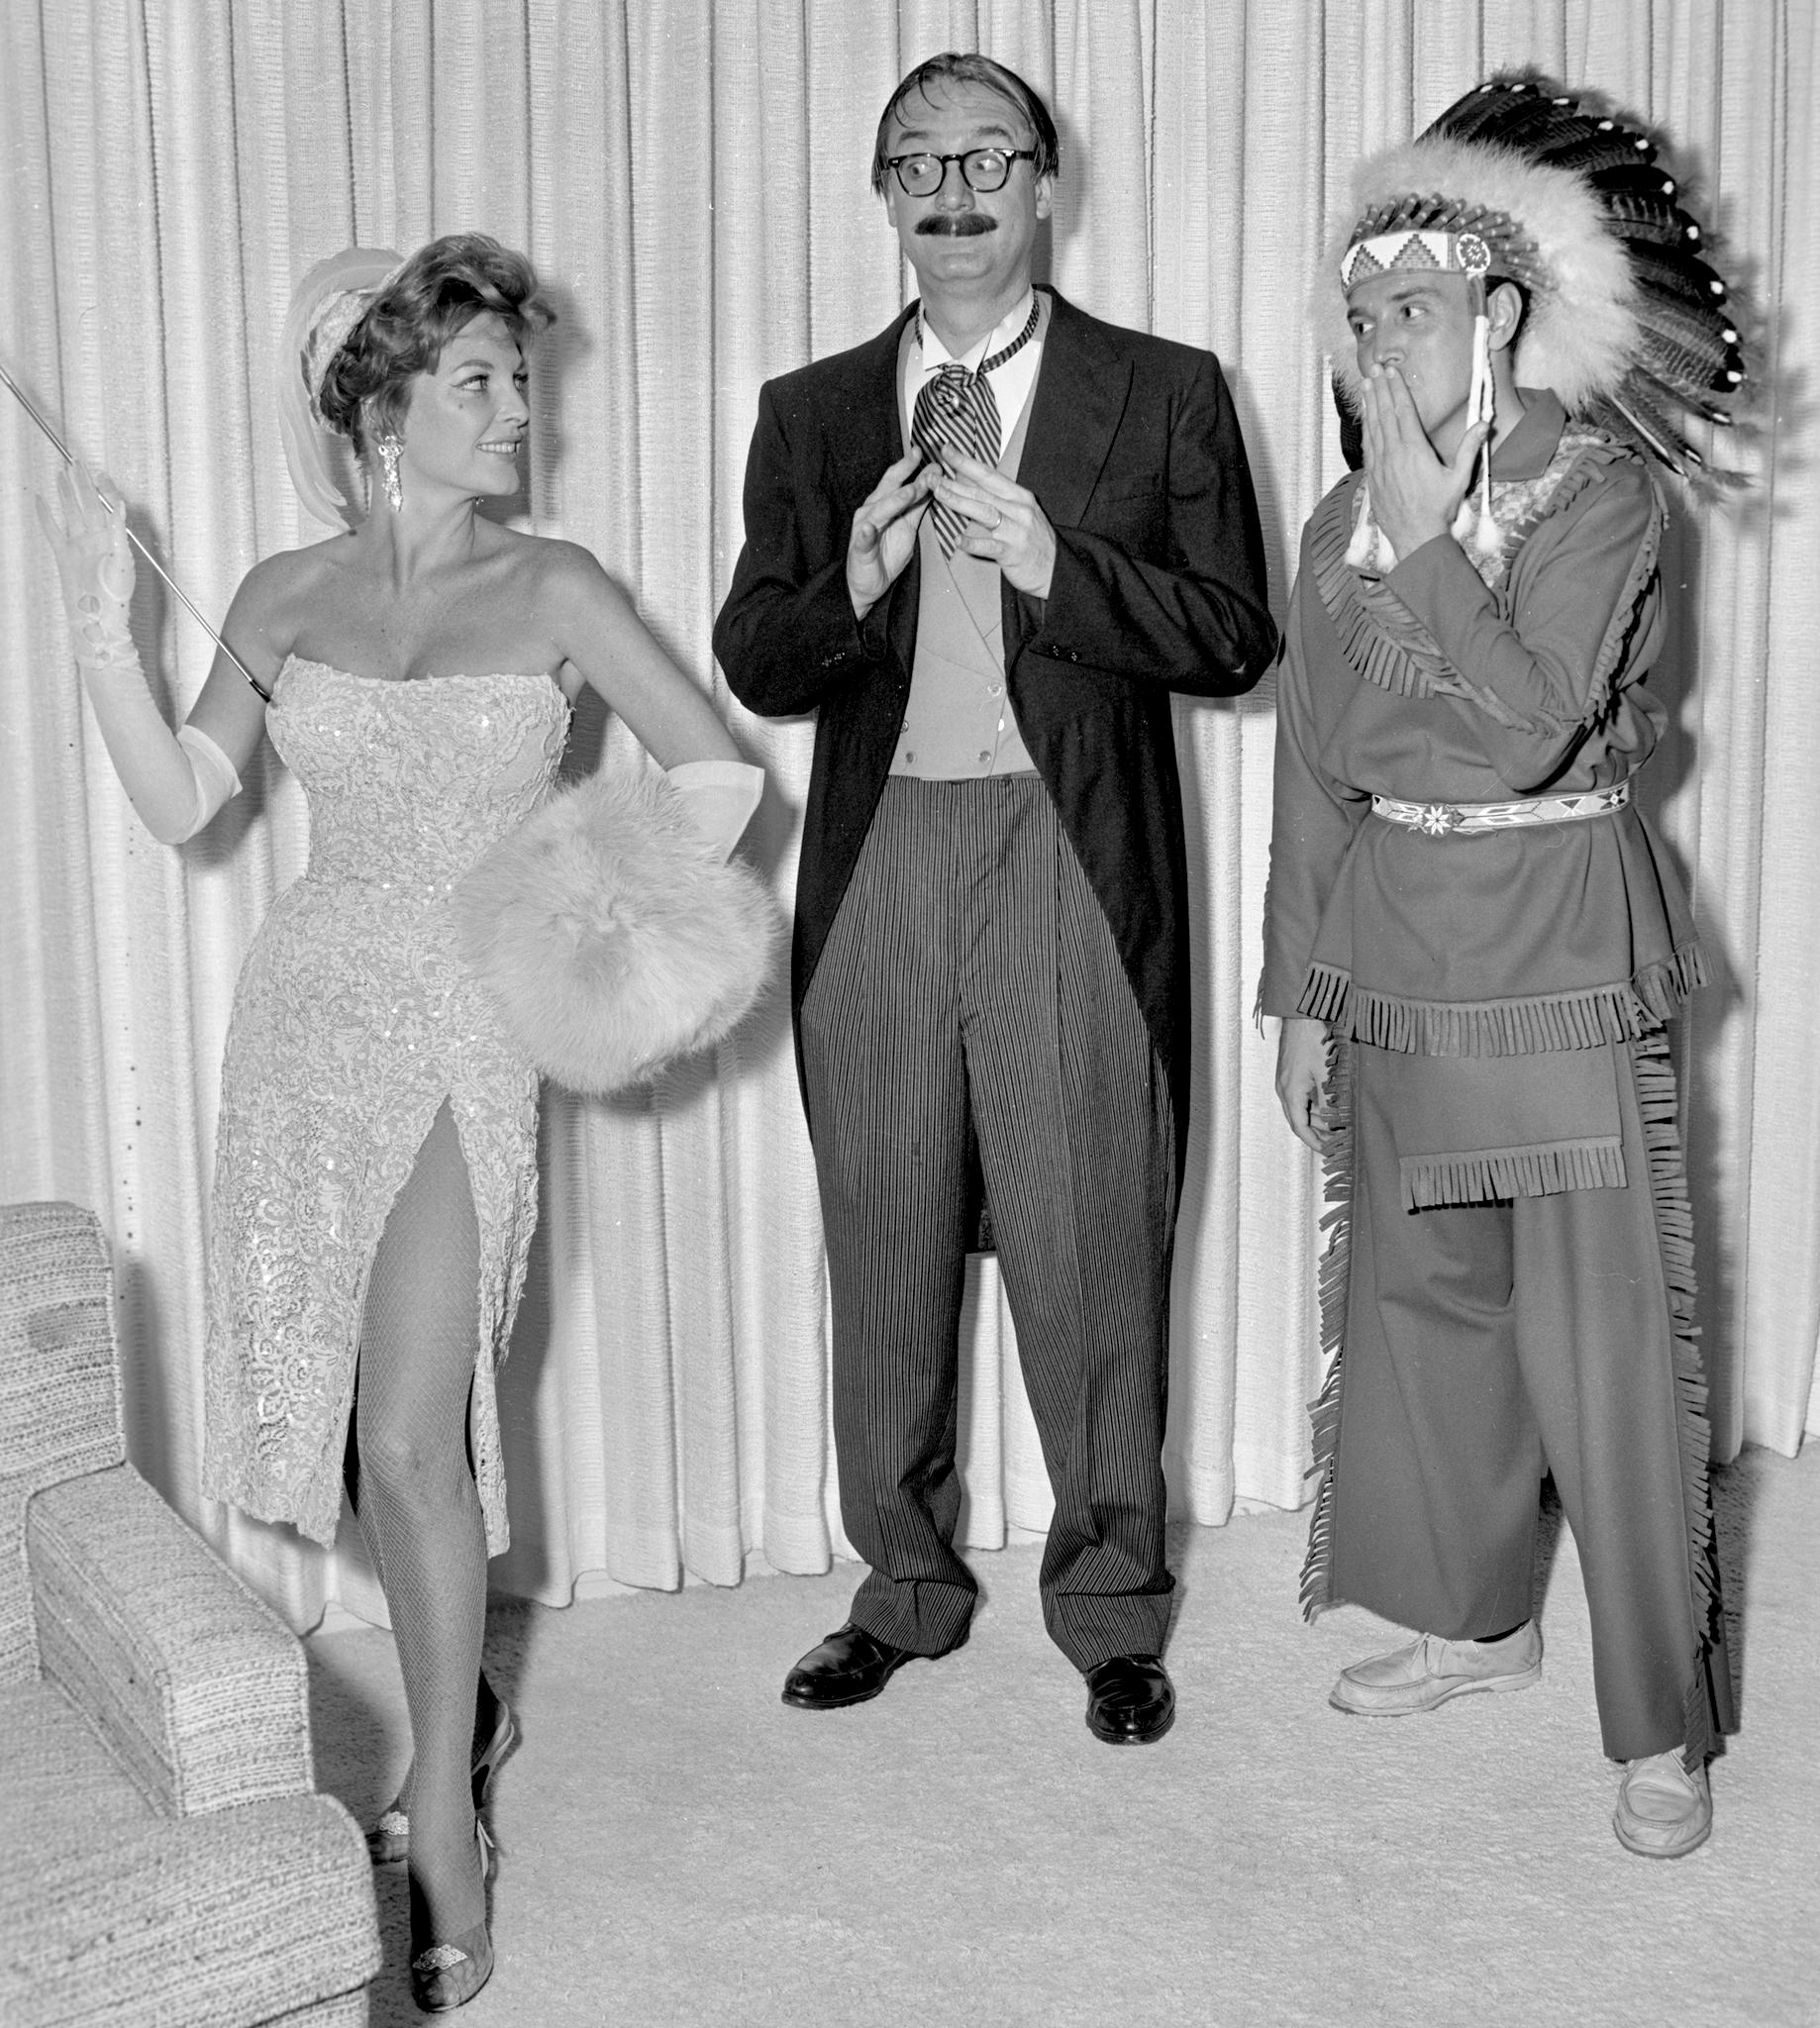 Julie London, Steve Allen, and Roger at a costume event